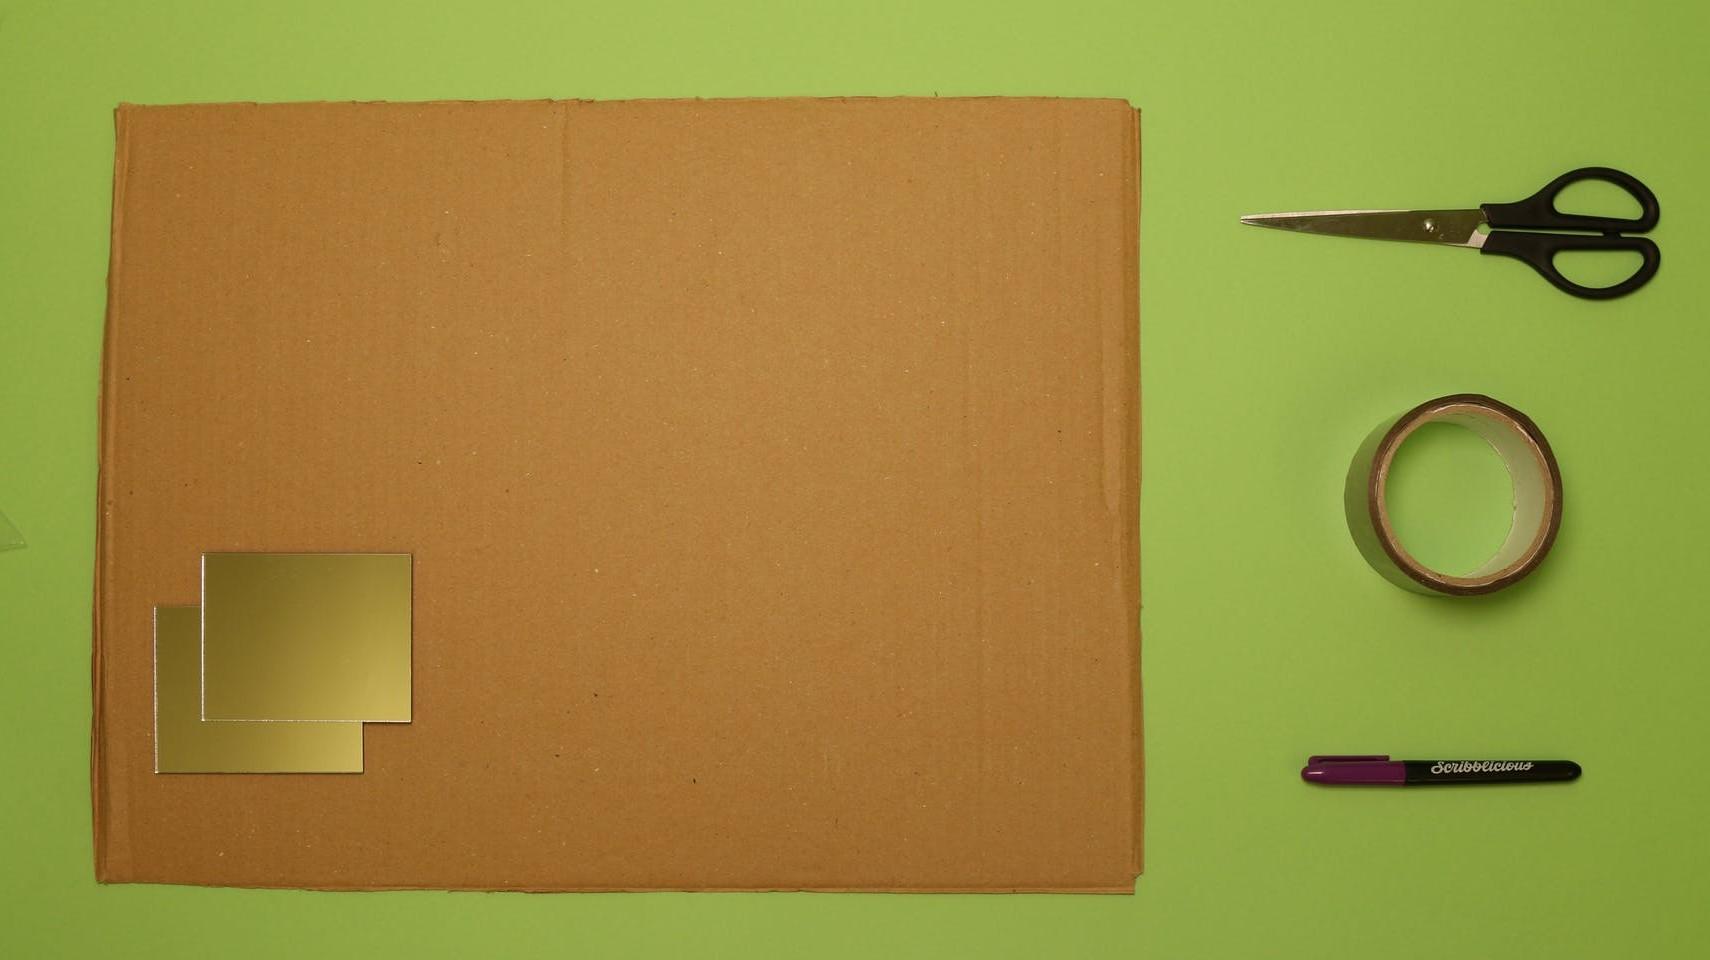 You will need - cardboard, mirrors, scissors, tape, pen